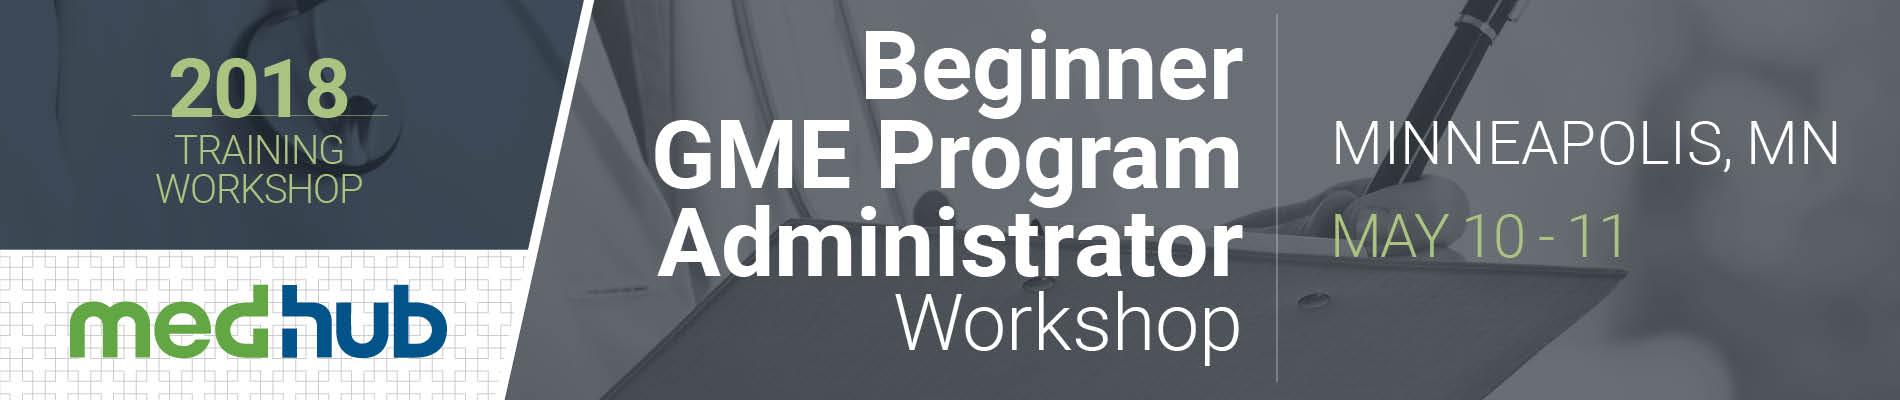 MedHub New GME Program Administrator Workshop (May 10-11)